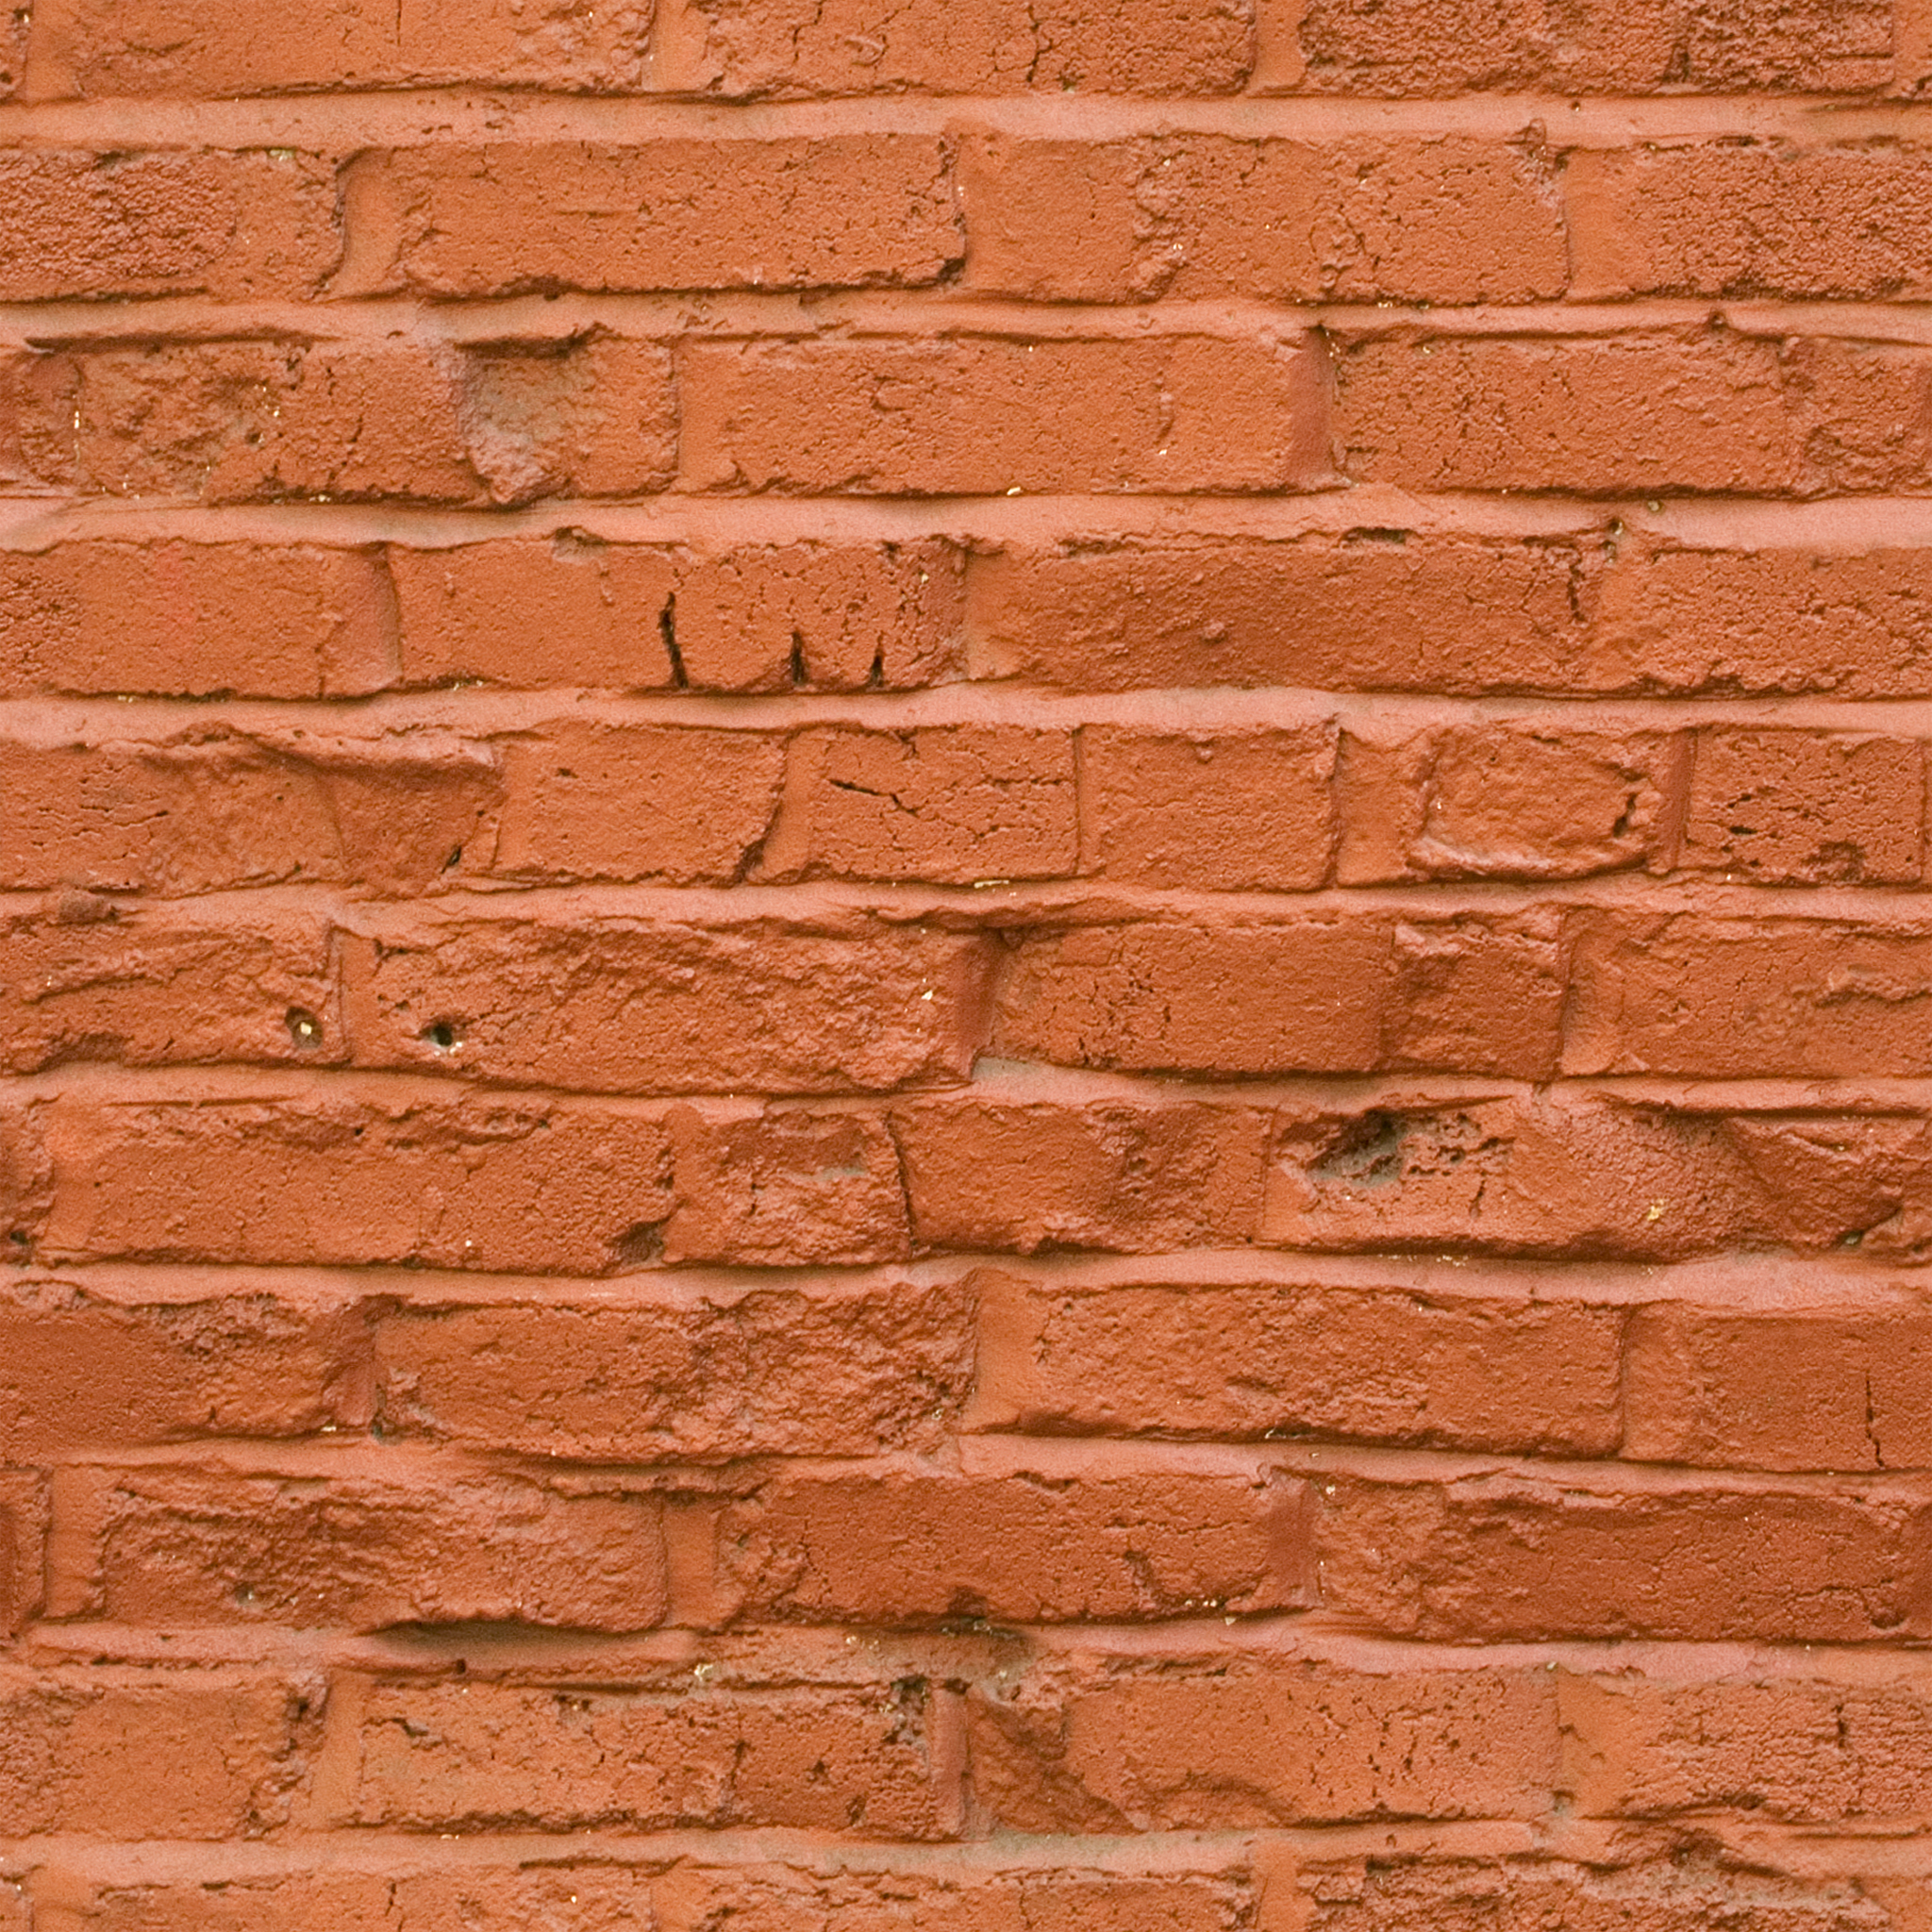 Red Orange Brick.jpg